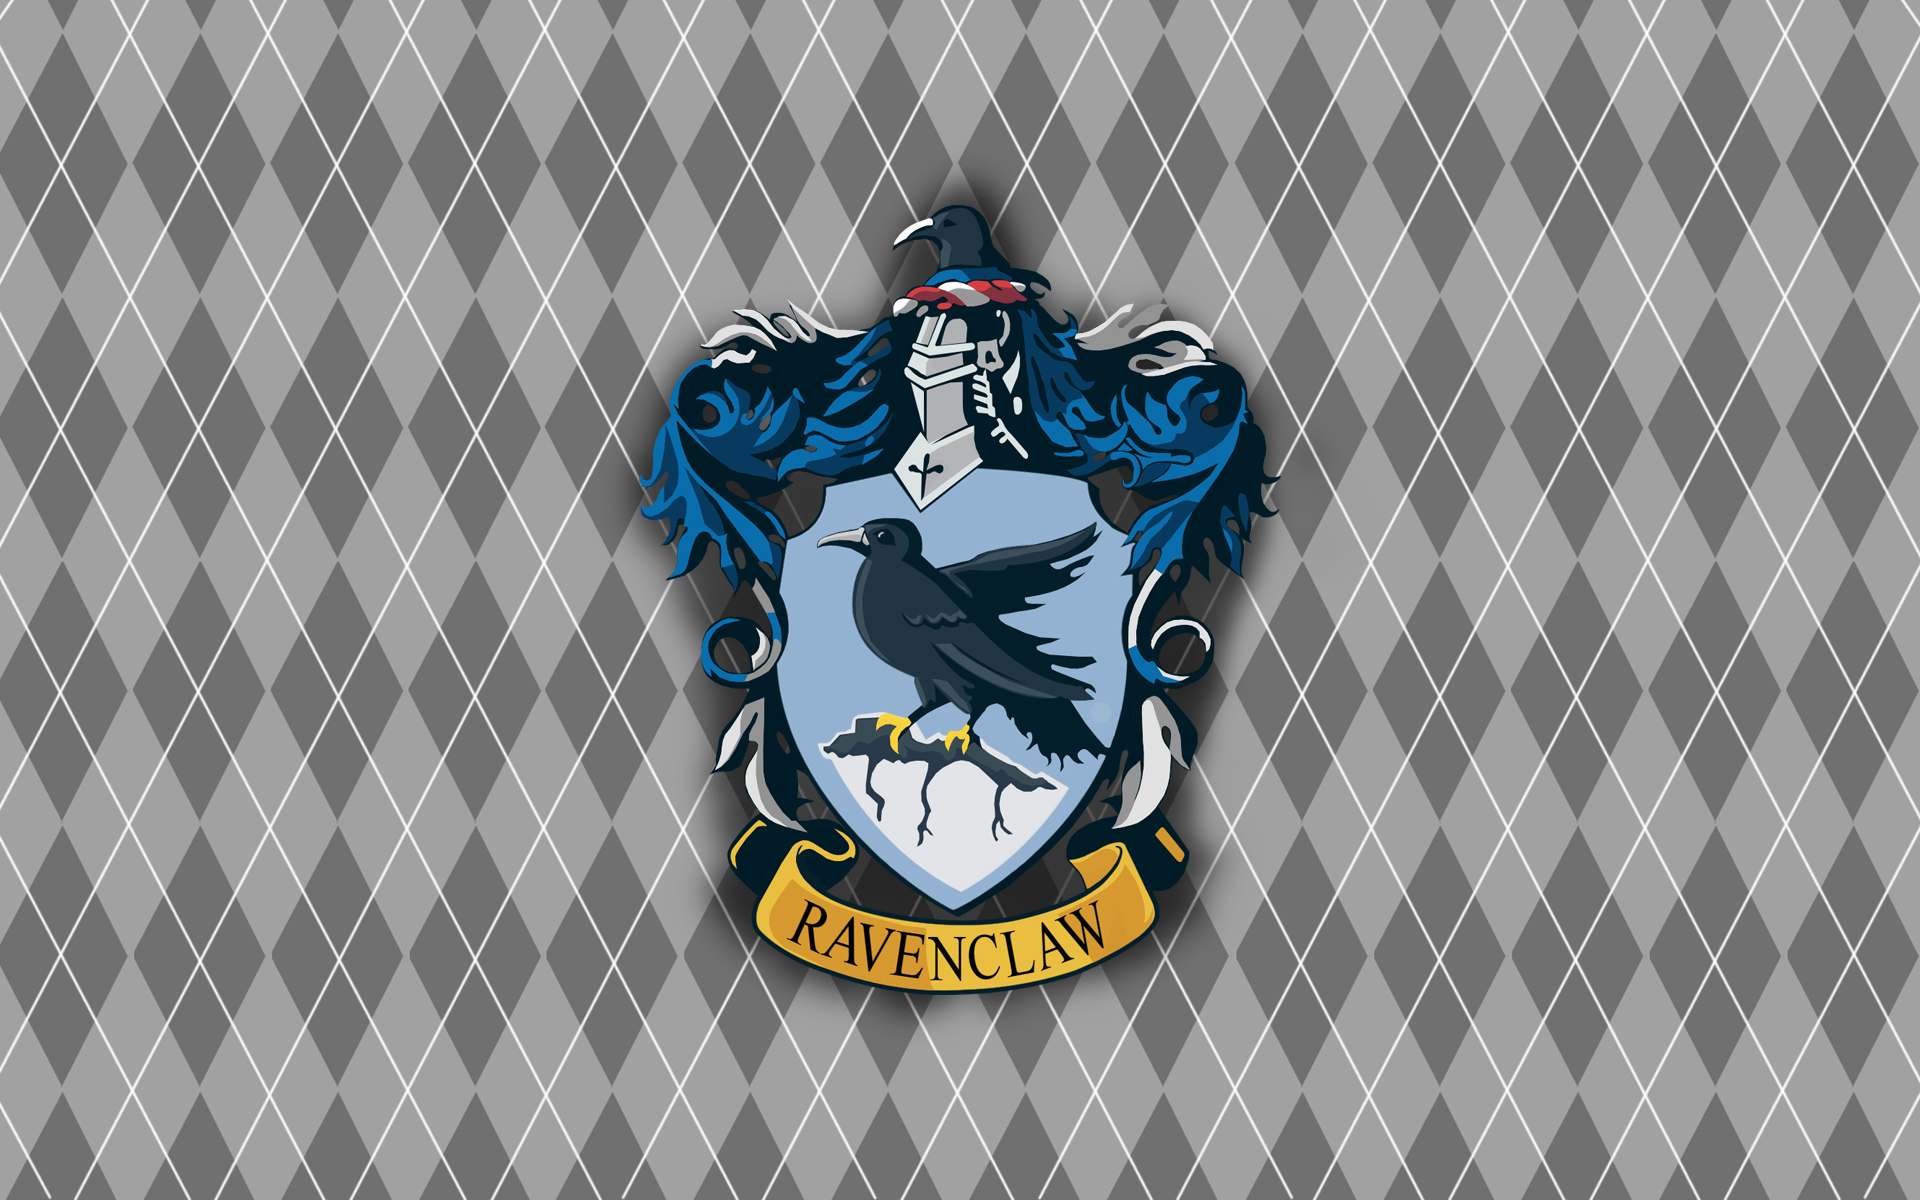 Ravenclaw Wallpaper by dragonlover28 1920x1200